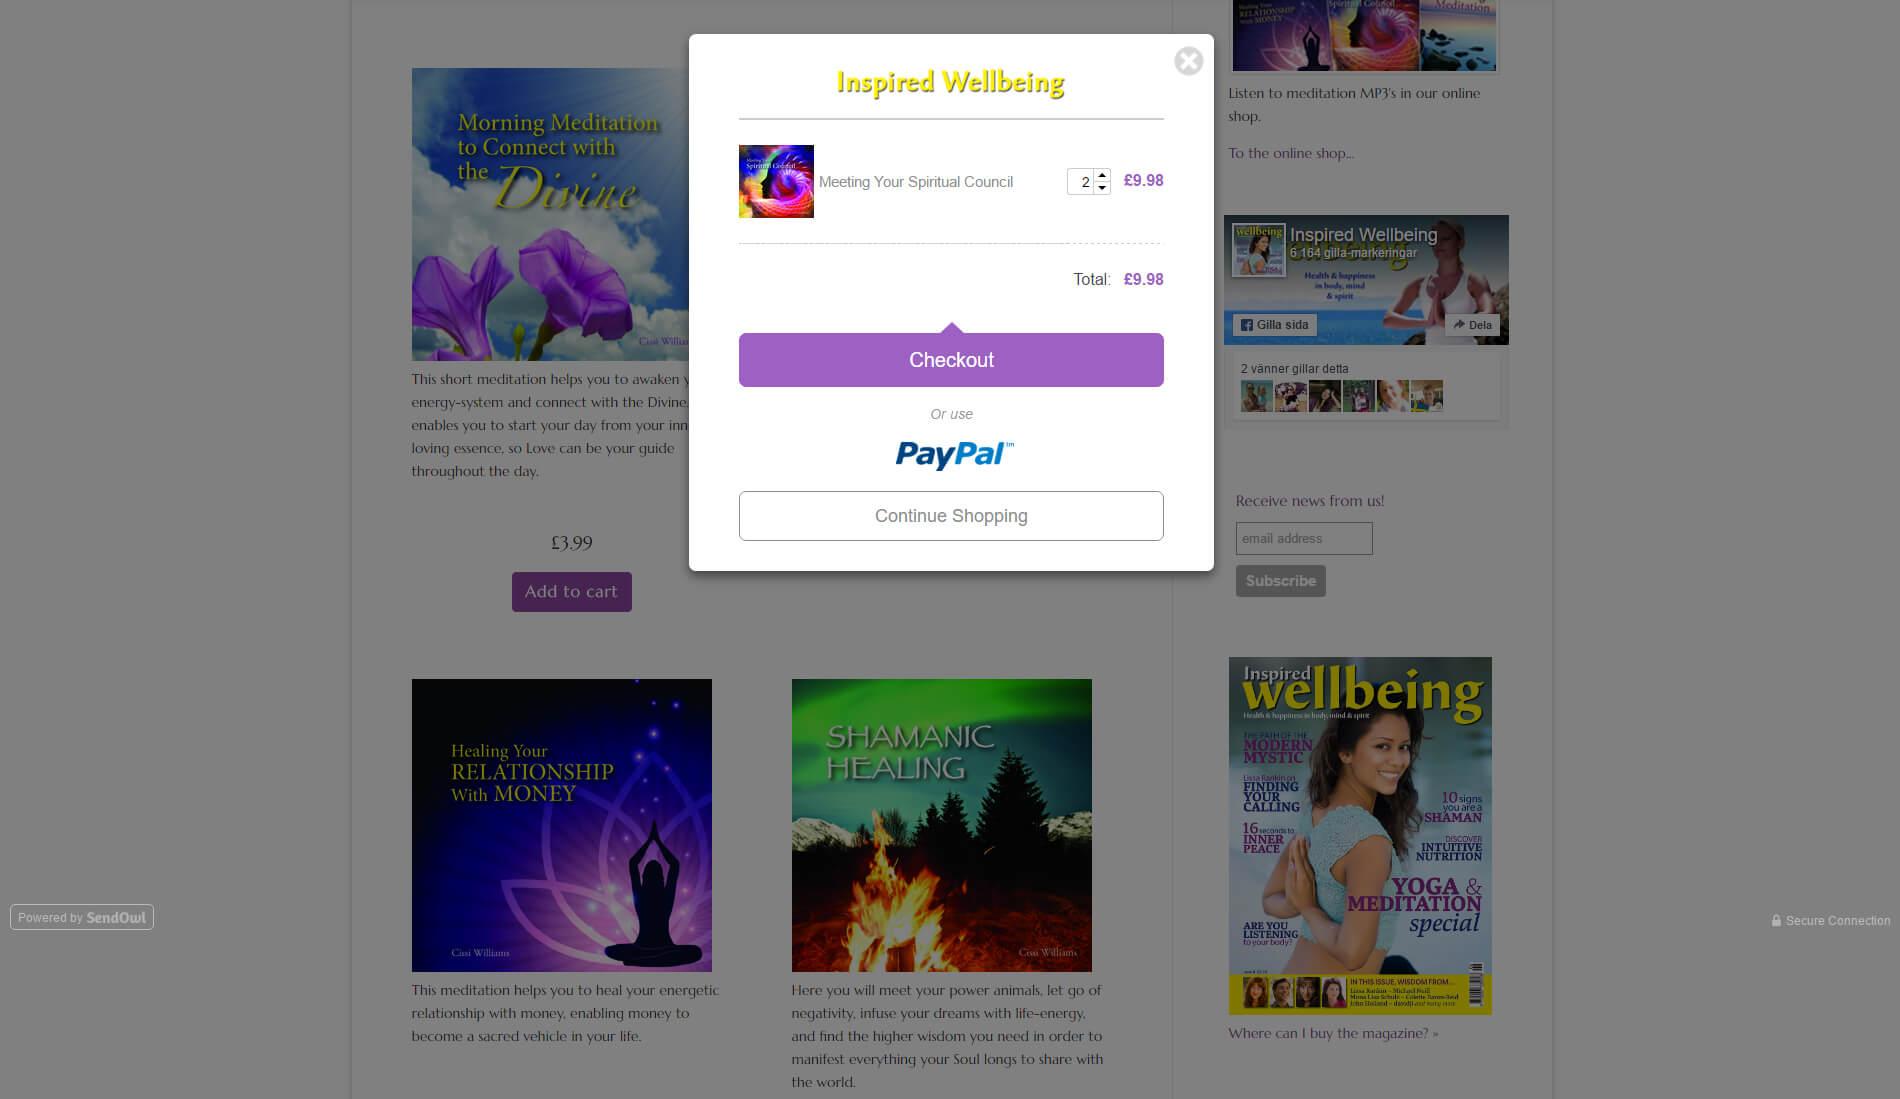 anweb Web design Webshop Inspired Wellbeing